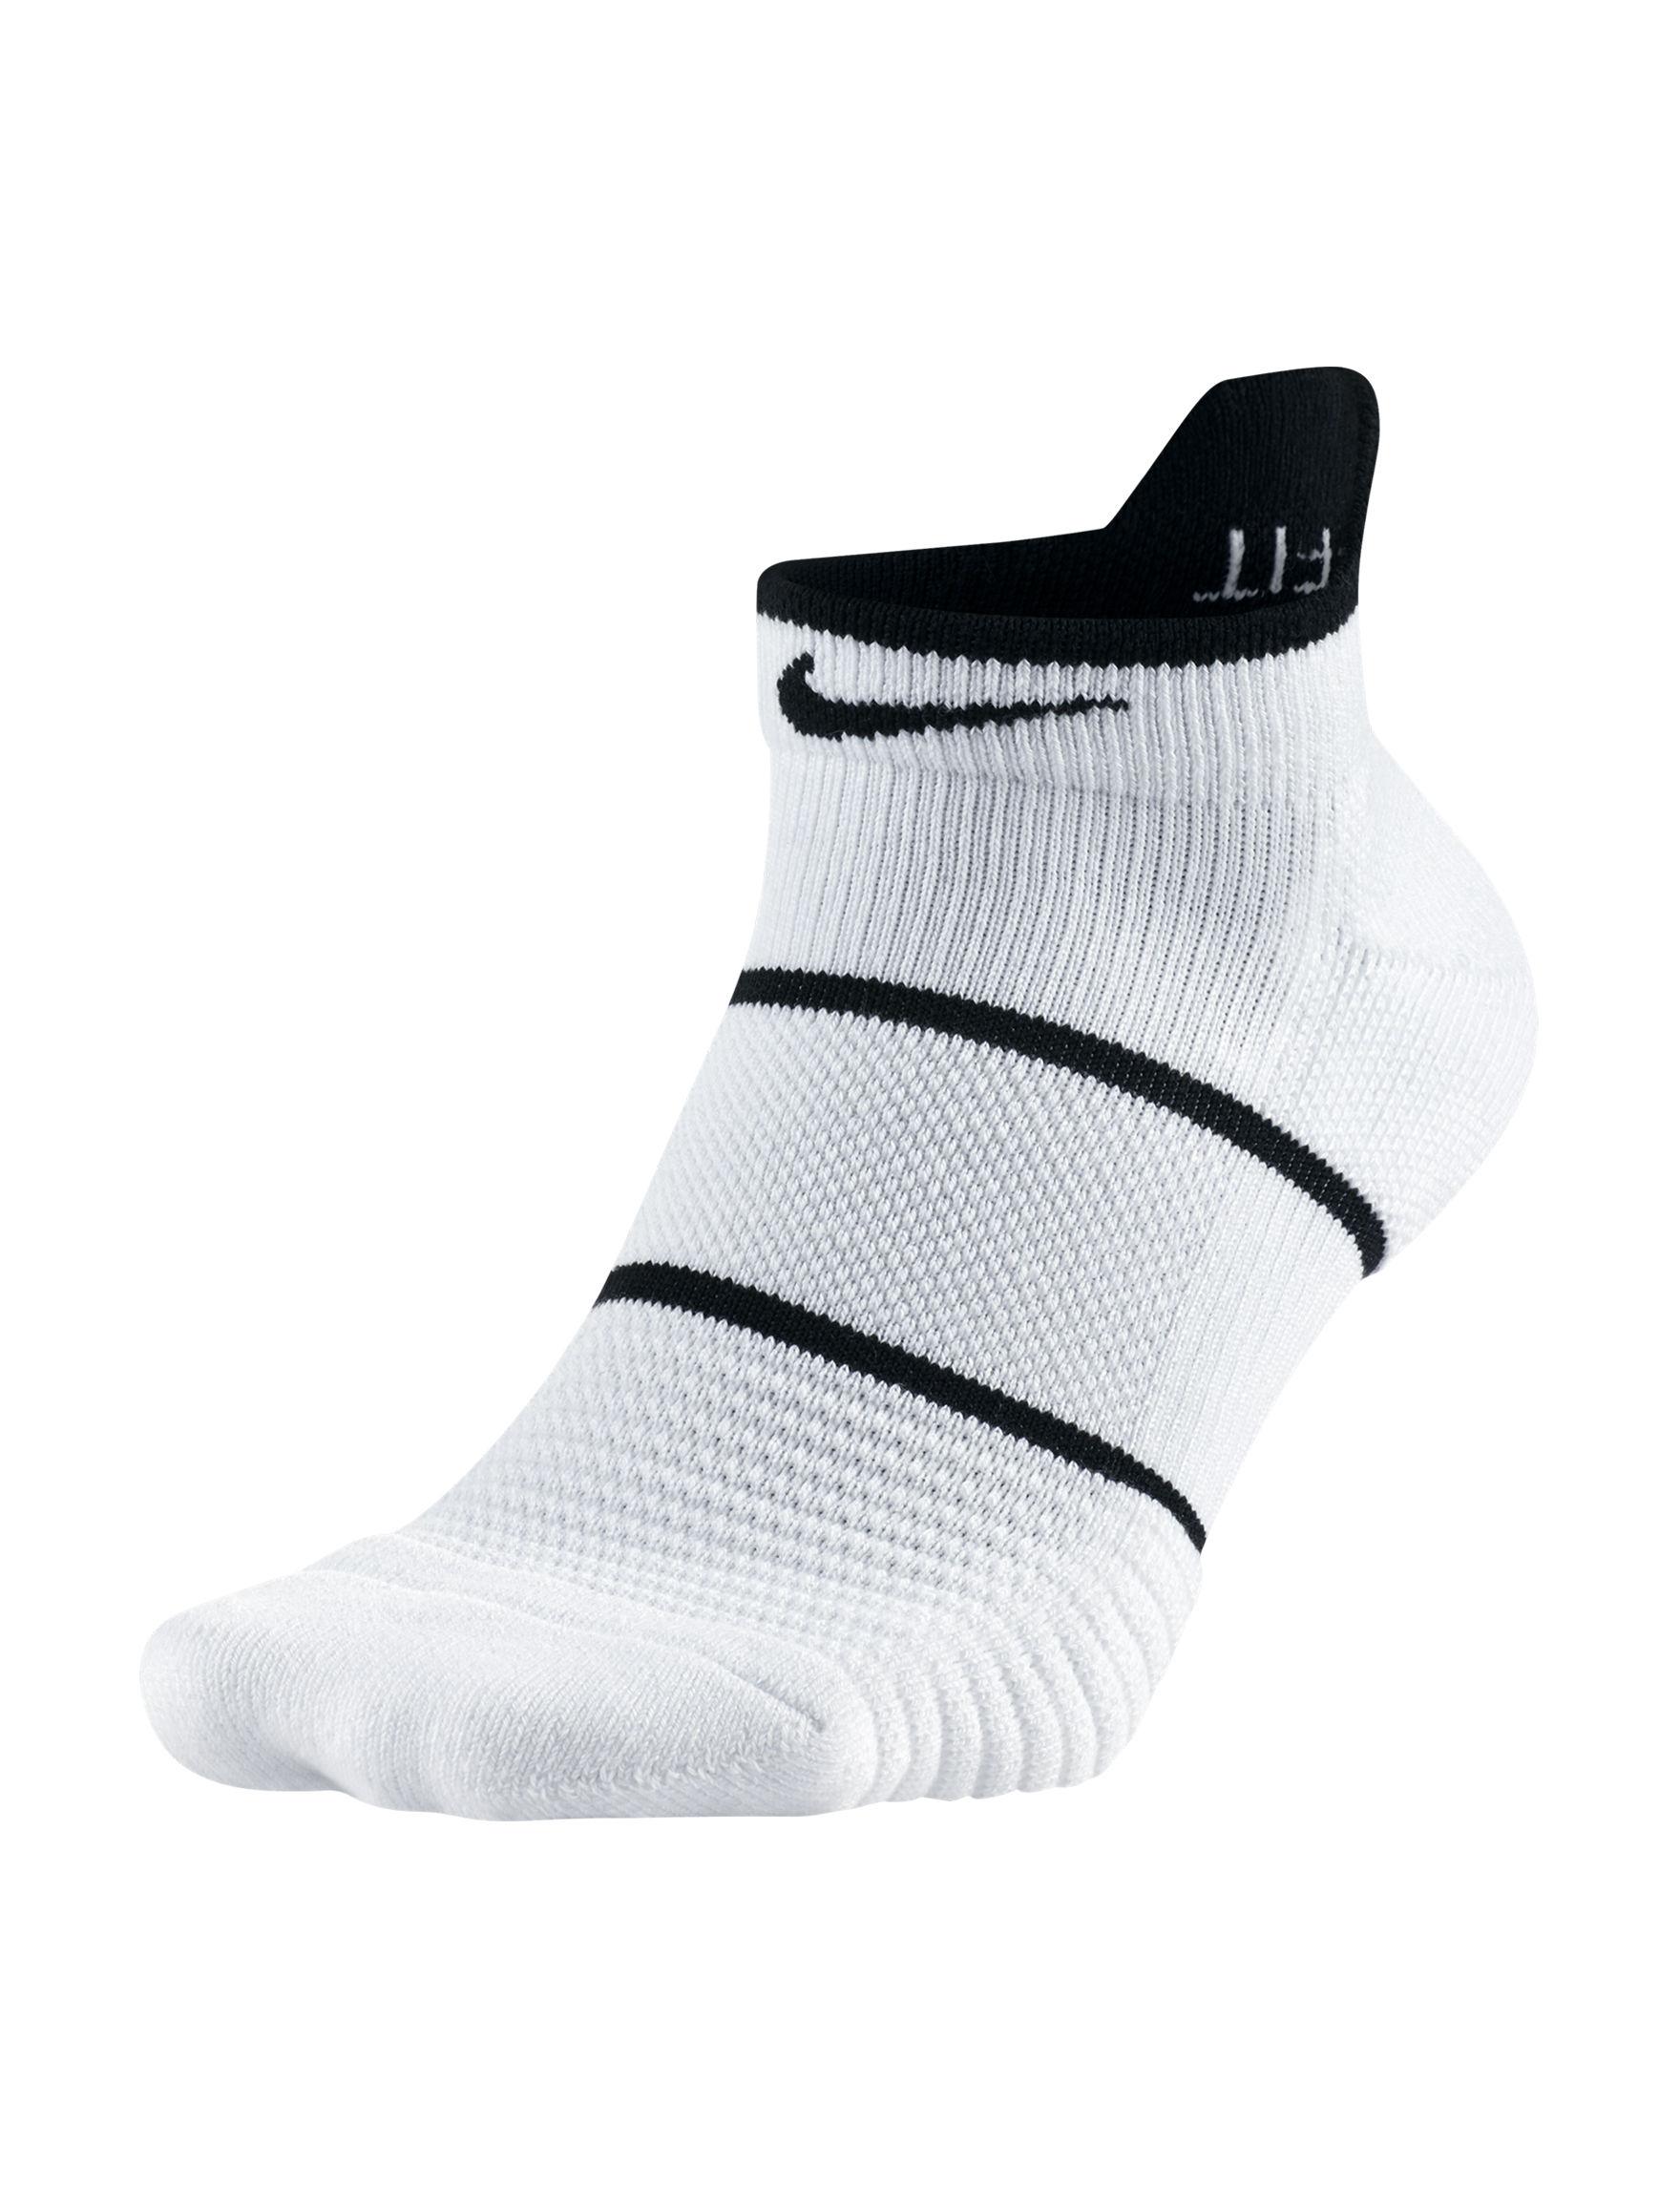 Nike White / Black Socks